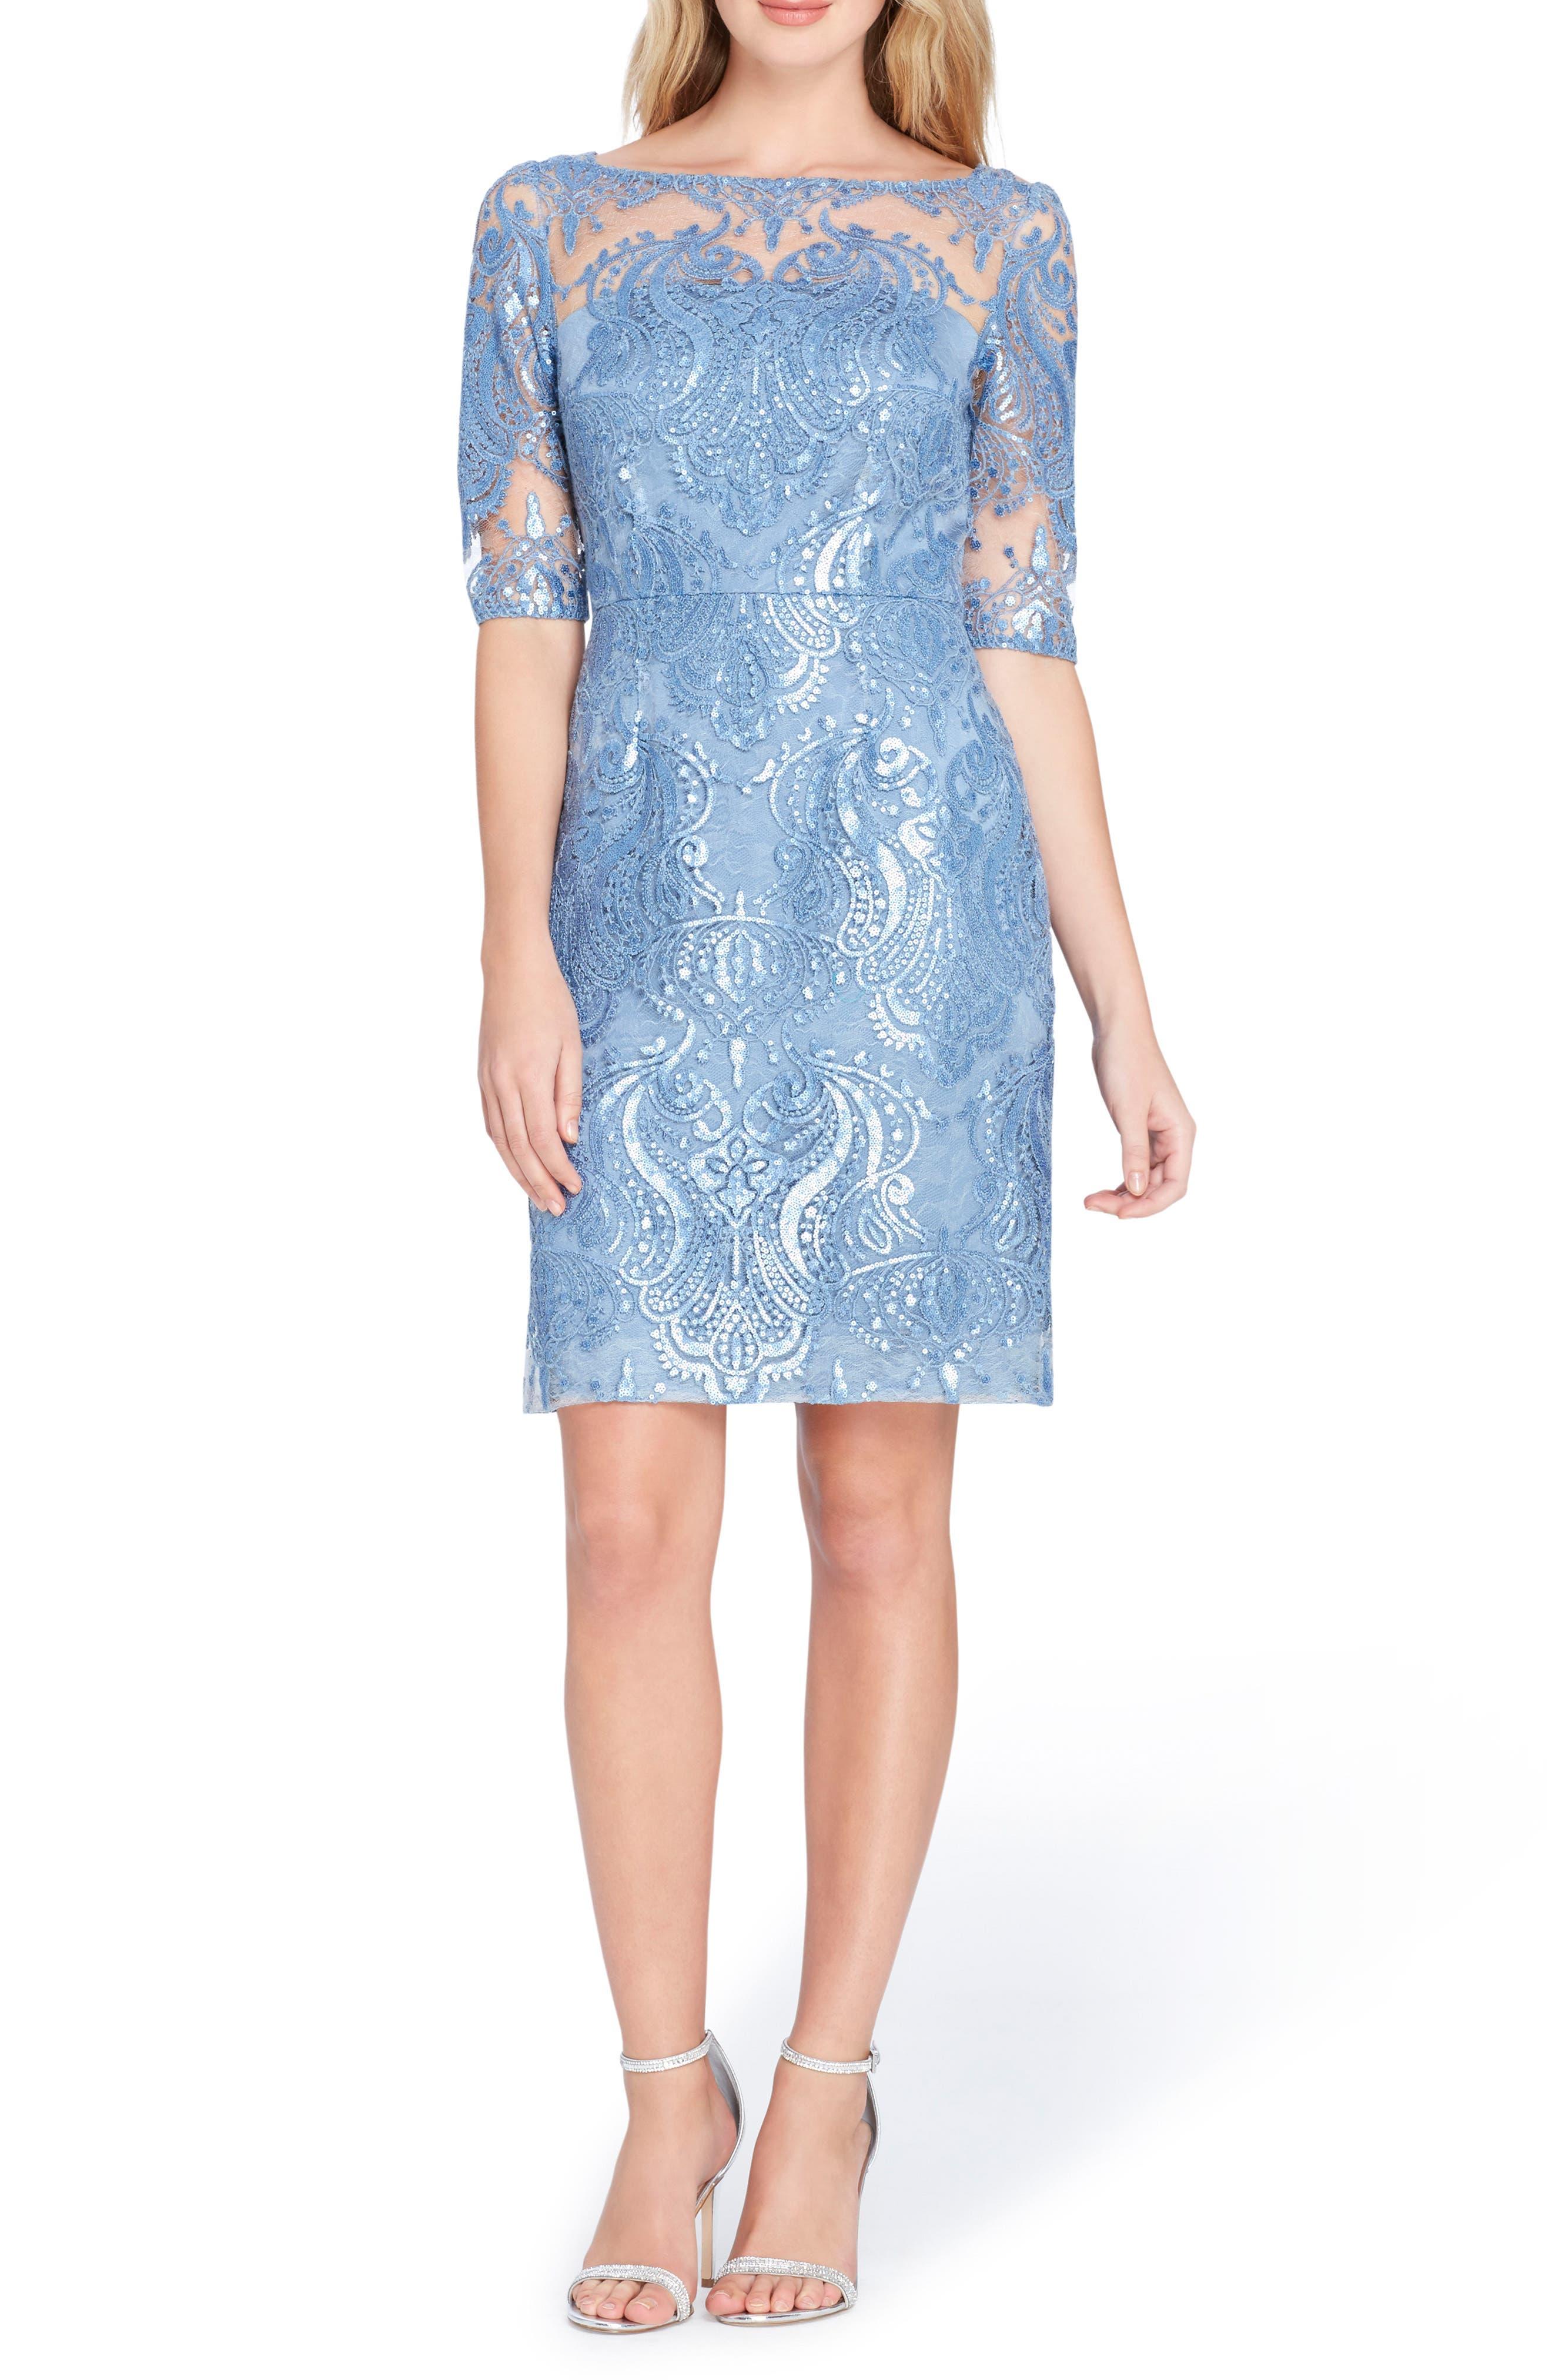 Sequin Sheath Dress,                             Main thumbnail 1, color,                             Periwinkle